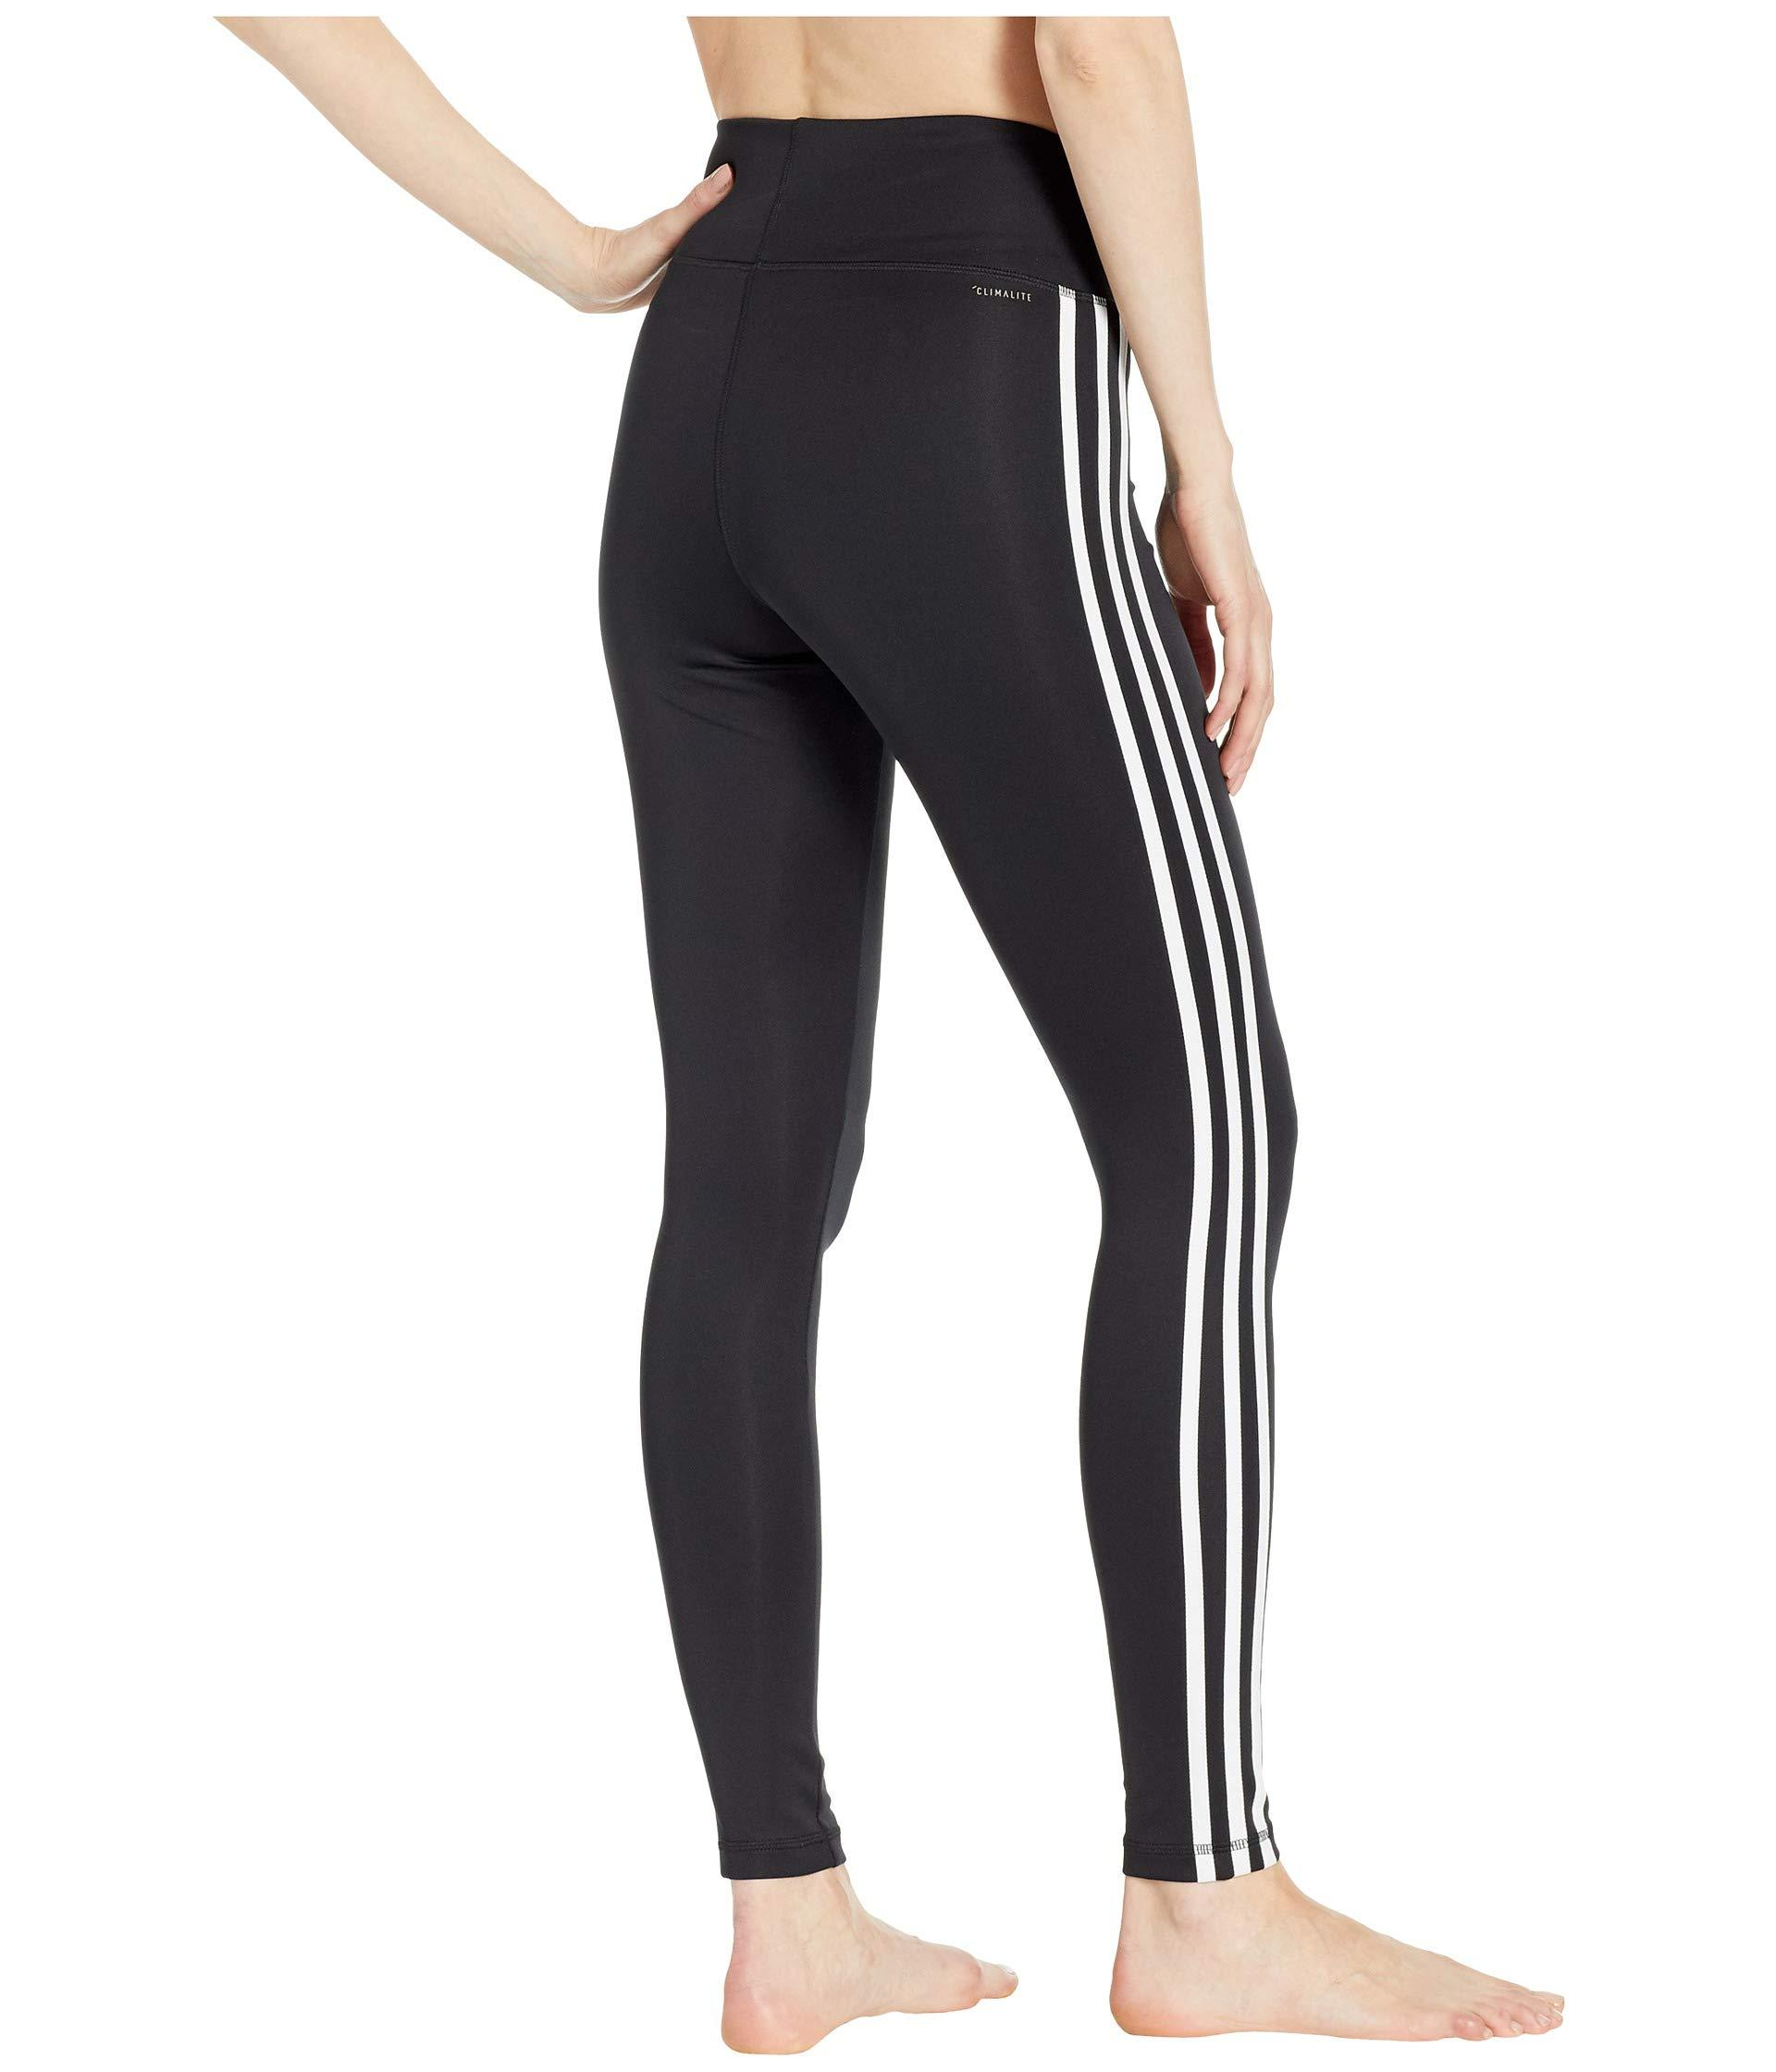 e8afe1003ed Adidas - Black Designed-2-move High-rise Long 3-stripes Tights. View  fullscreen